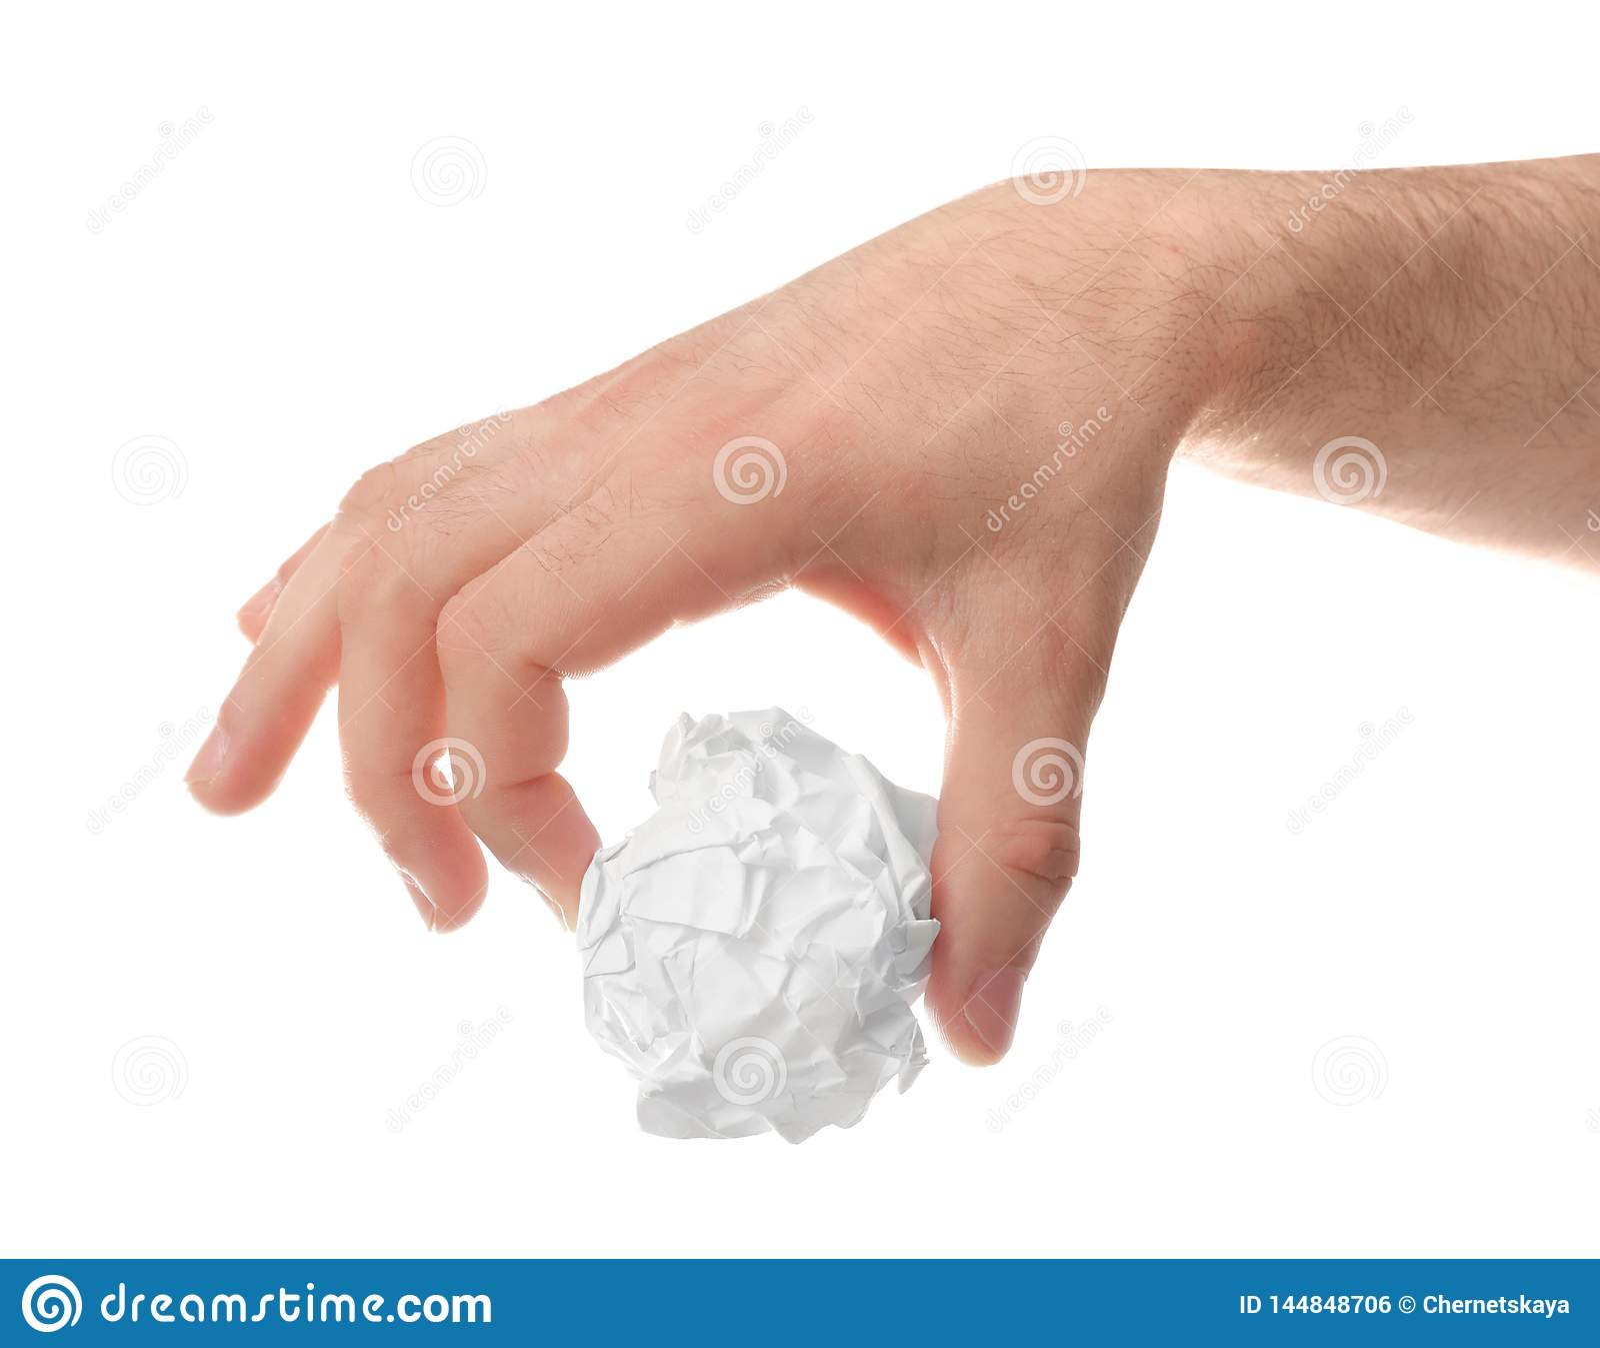 Man crumpling paper against white background, closeup. Generating